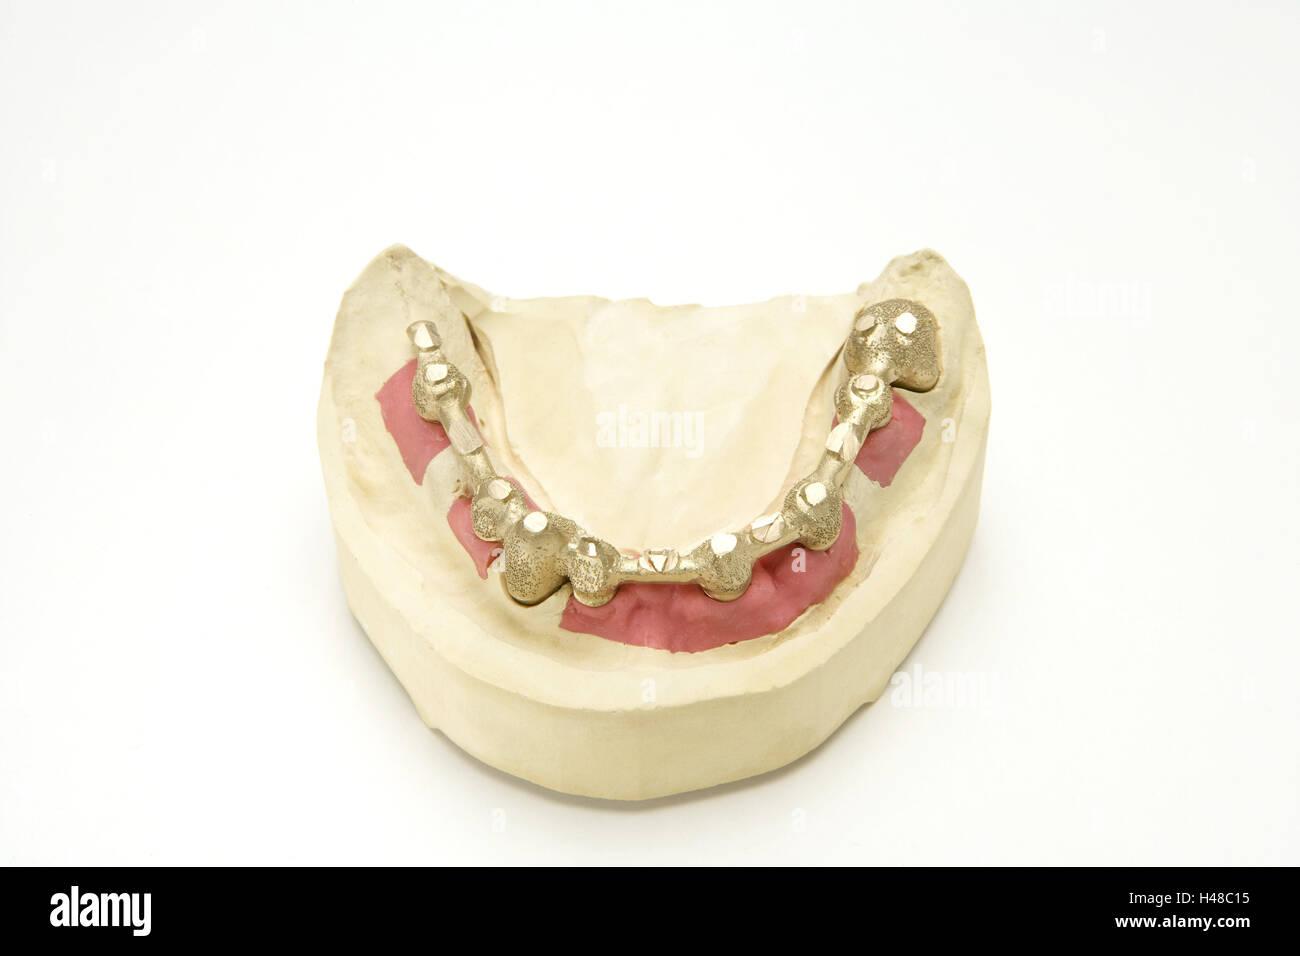 Set dentures, crowns, gypsum model, cog laboratory, denture, prosthesis, bite, loosely, gold teeth, cog precaution, - Stock Image